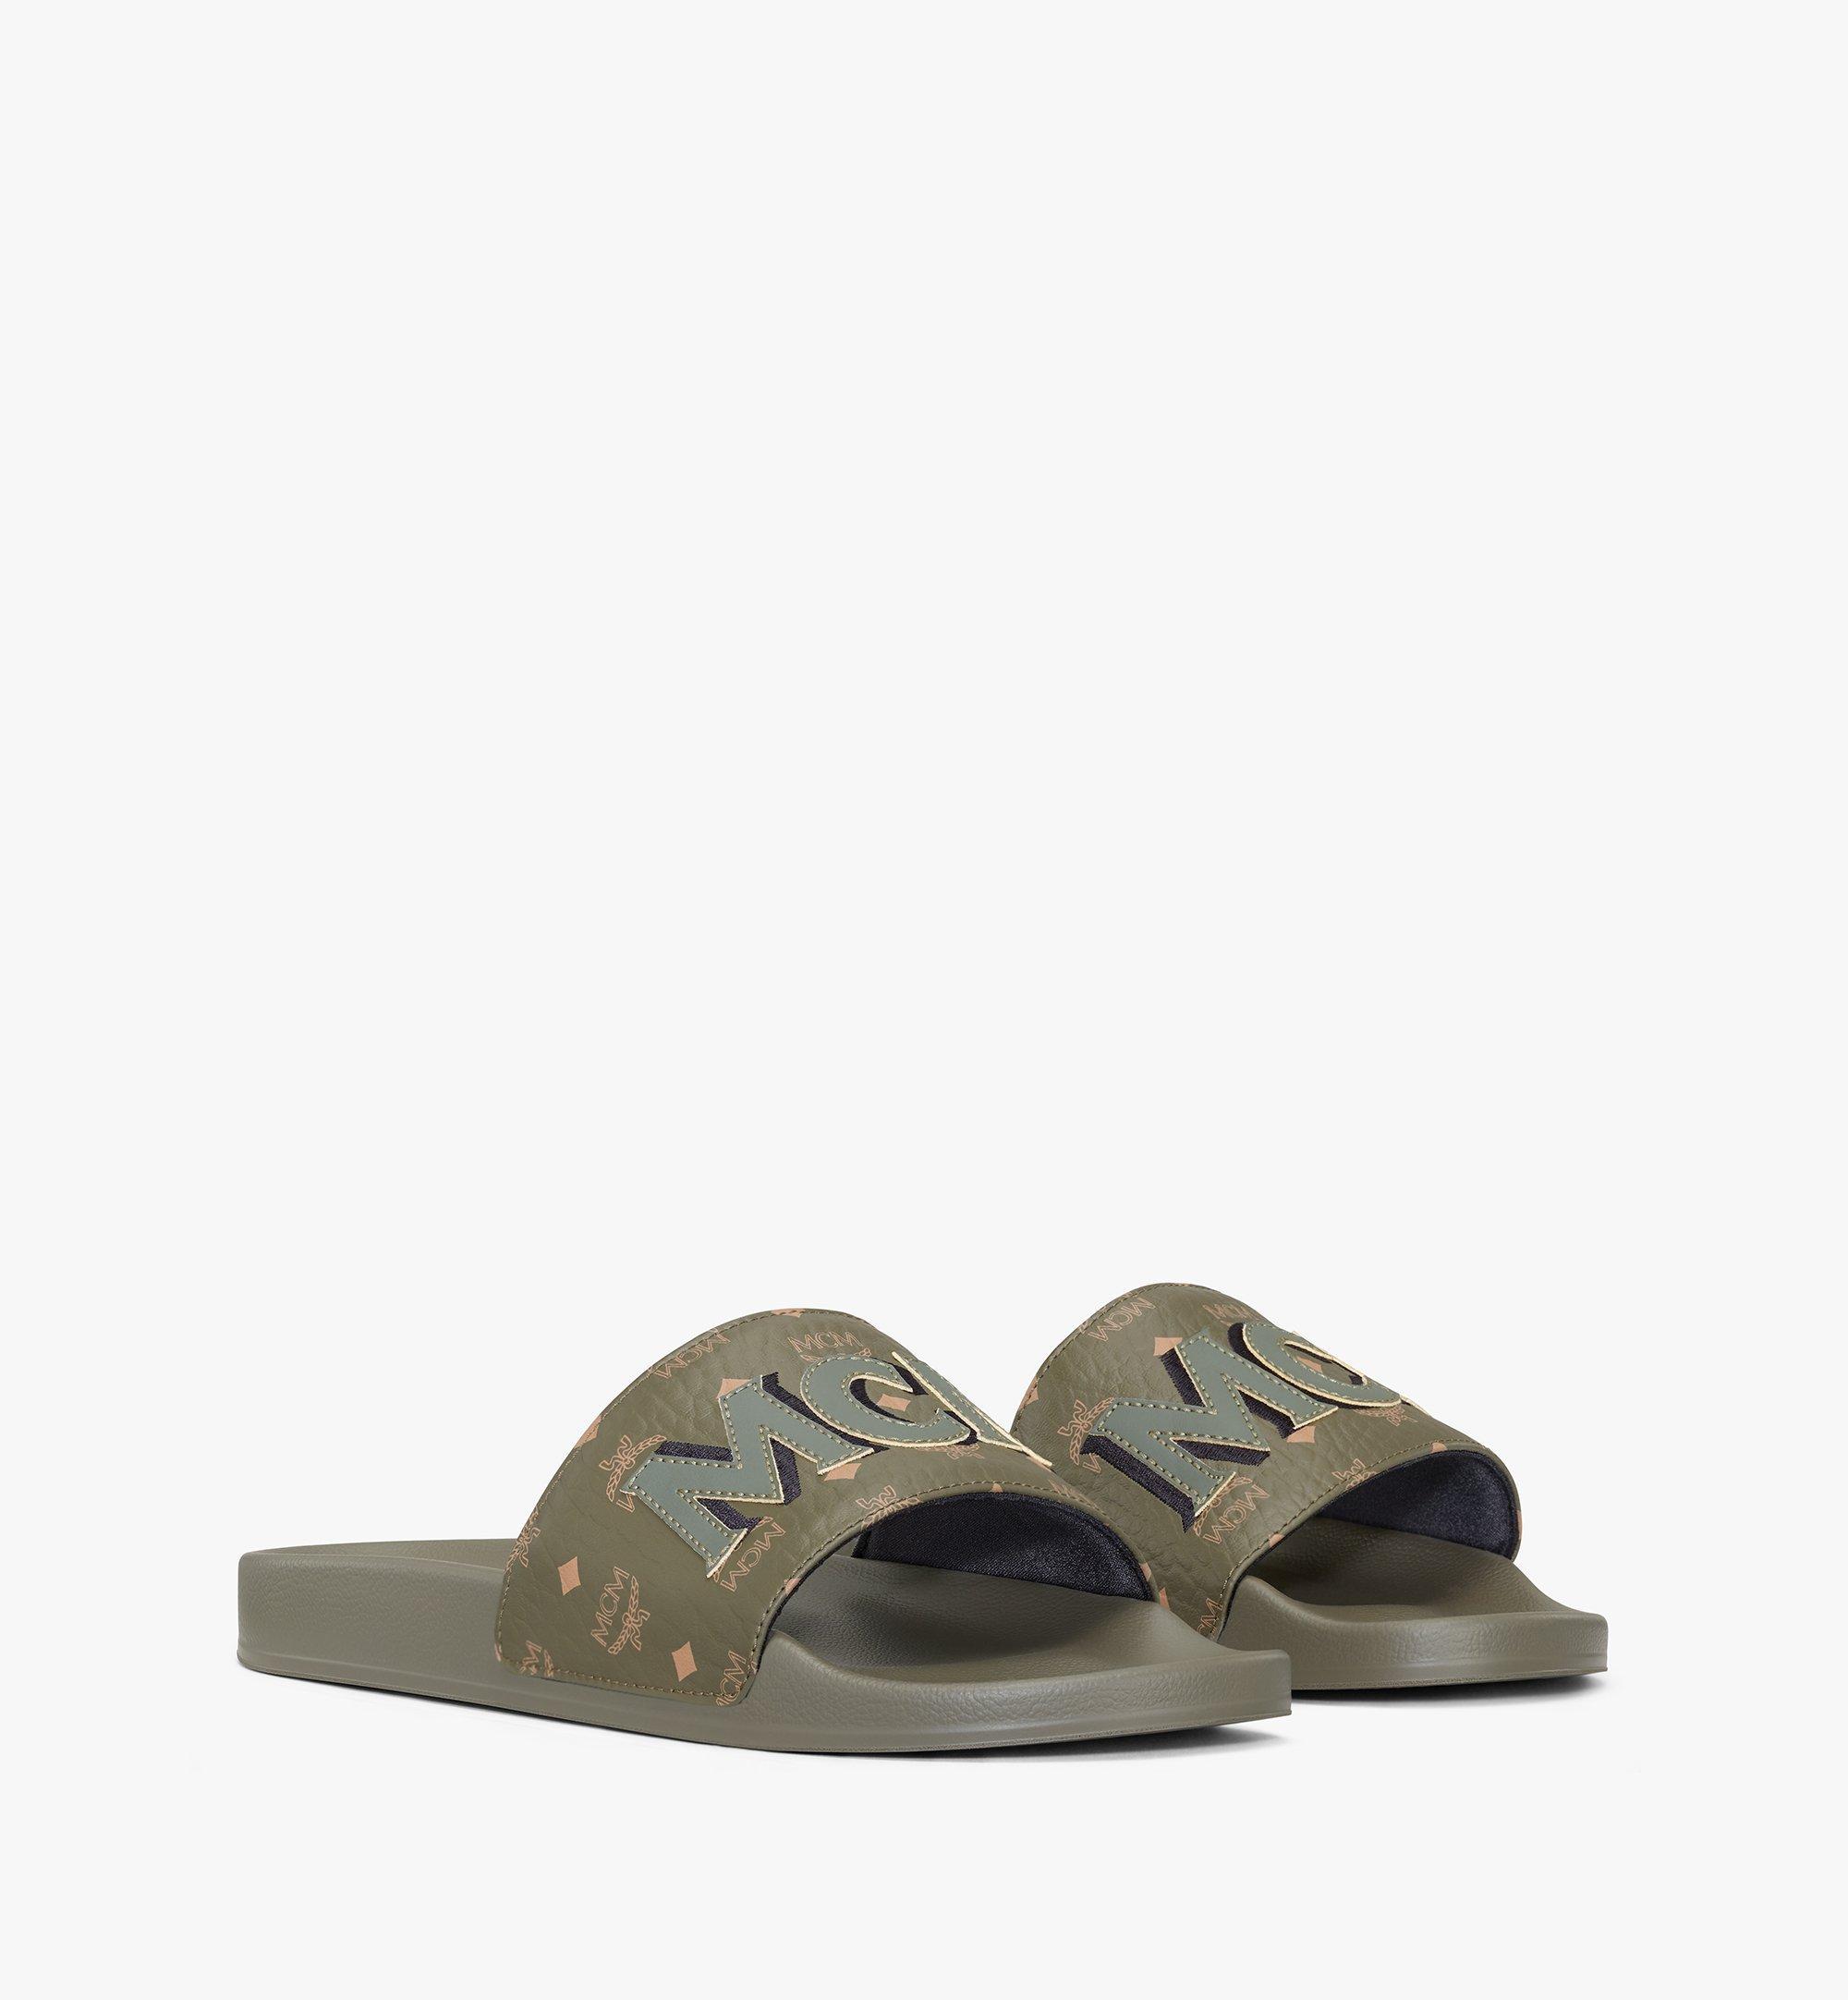 MCM รองเท้าแตะ MCM โมโนแกรมสำหรับผู้ชาย Green MEXAAMM16JH043 มุมมองอื่น 1